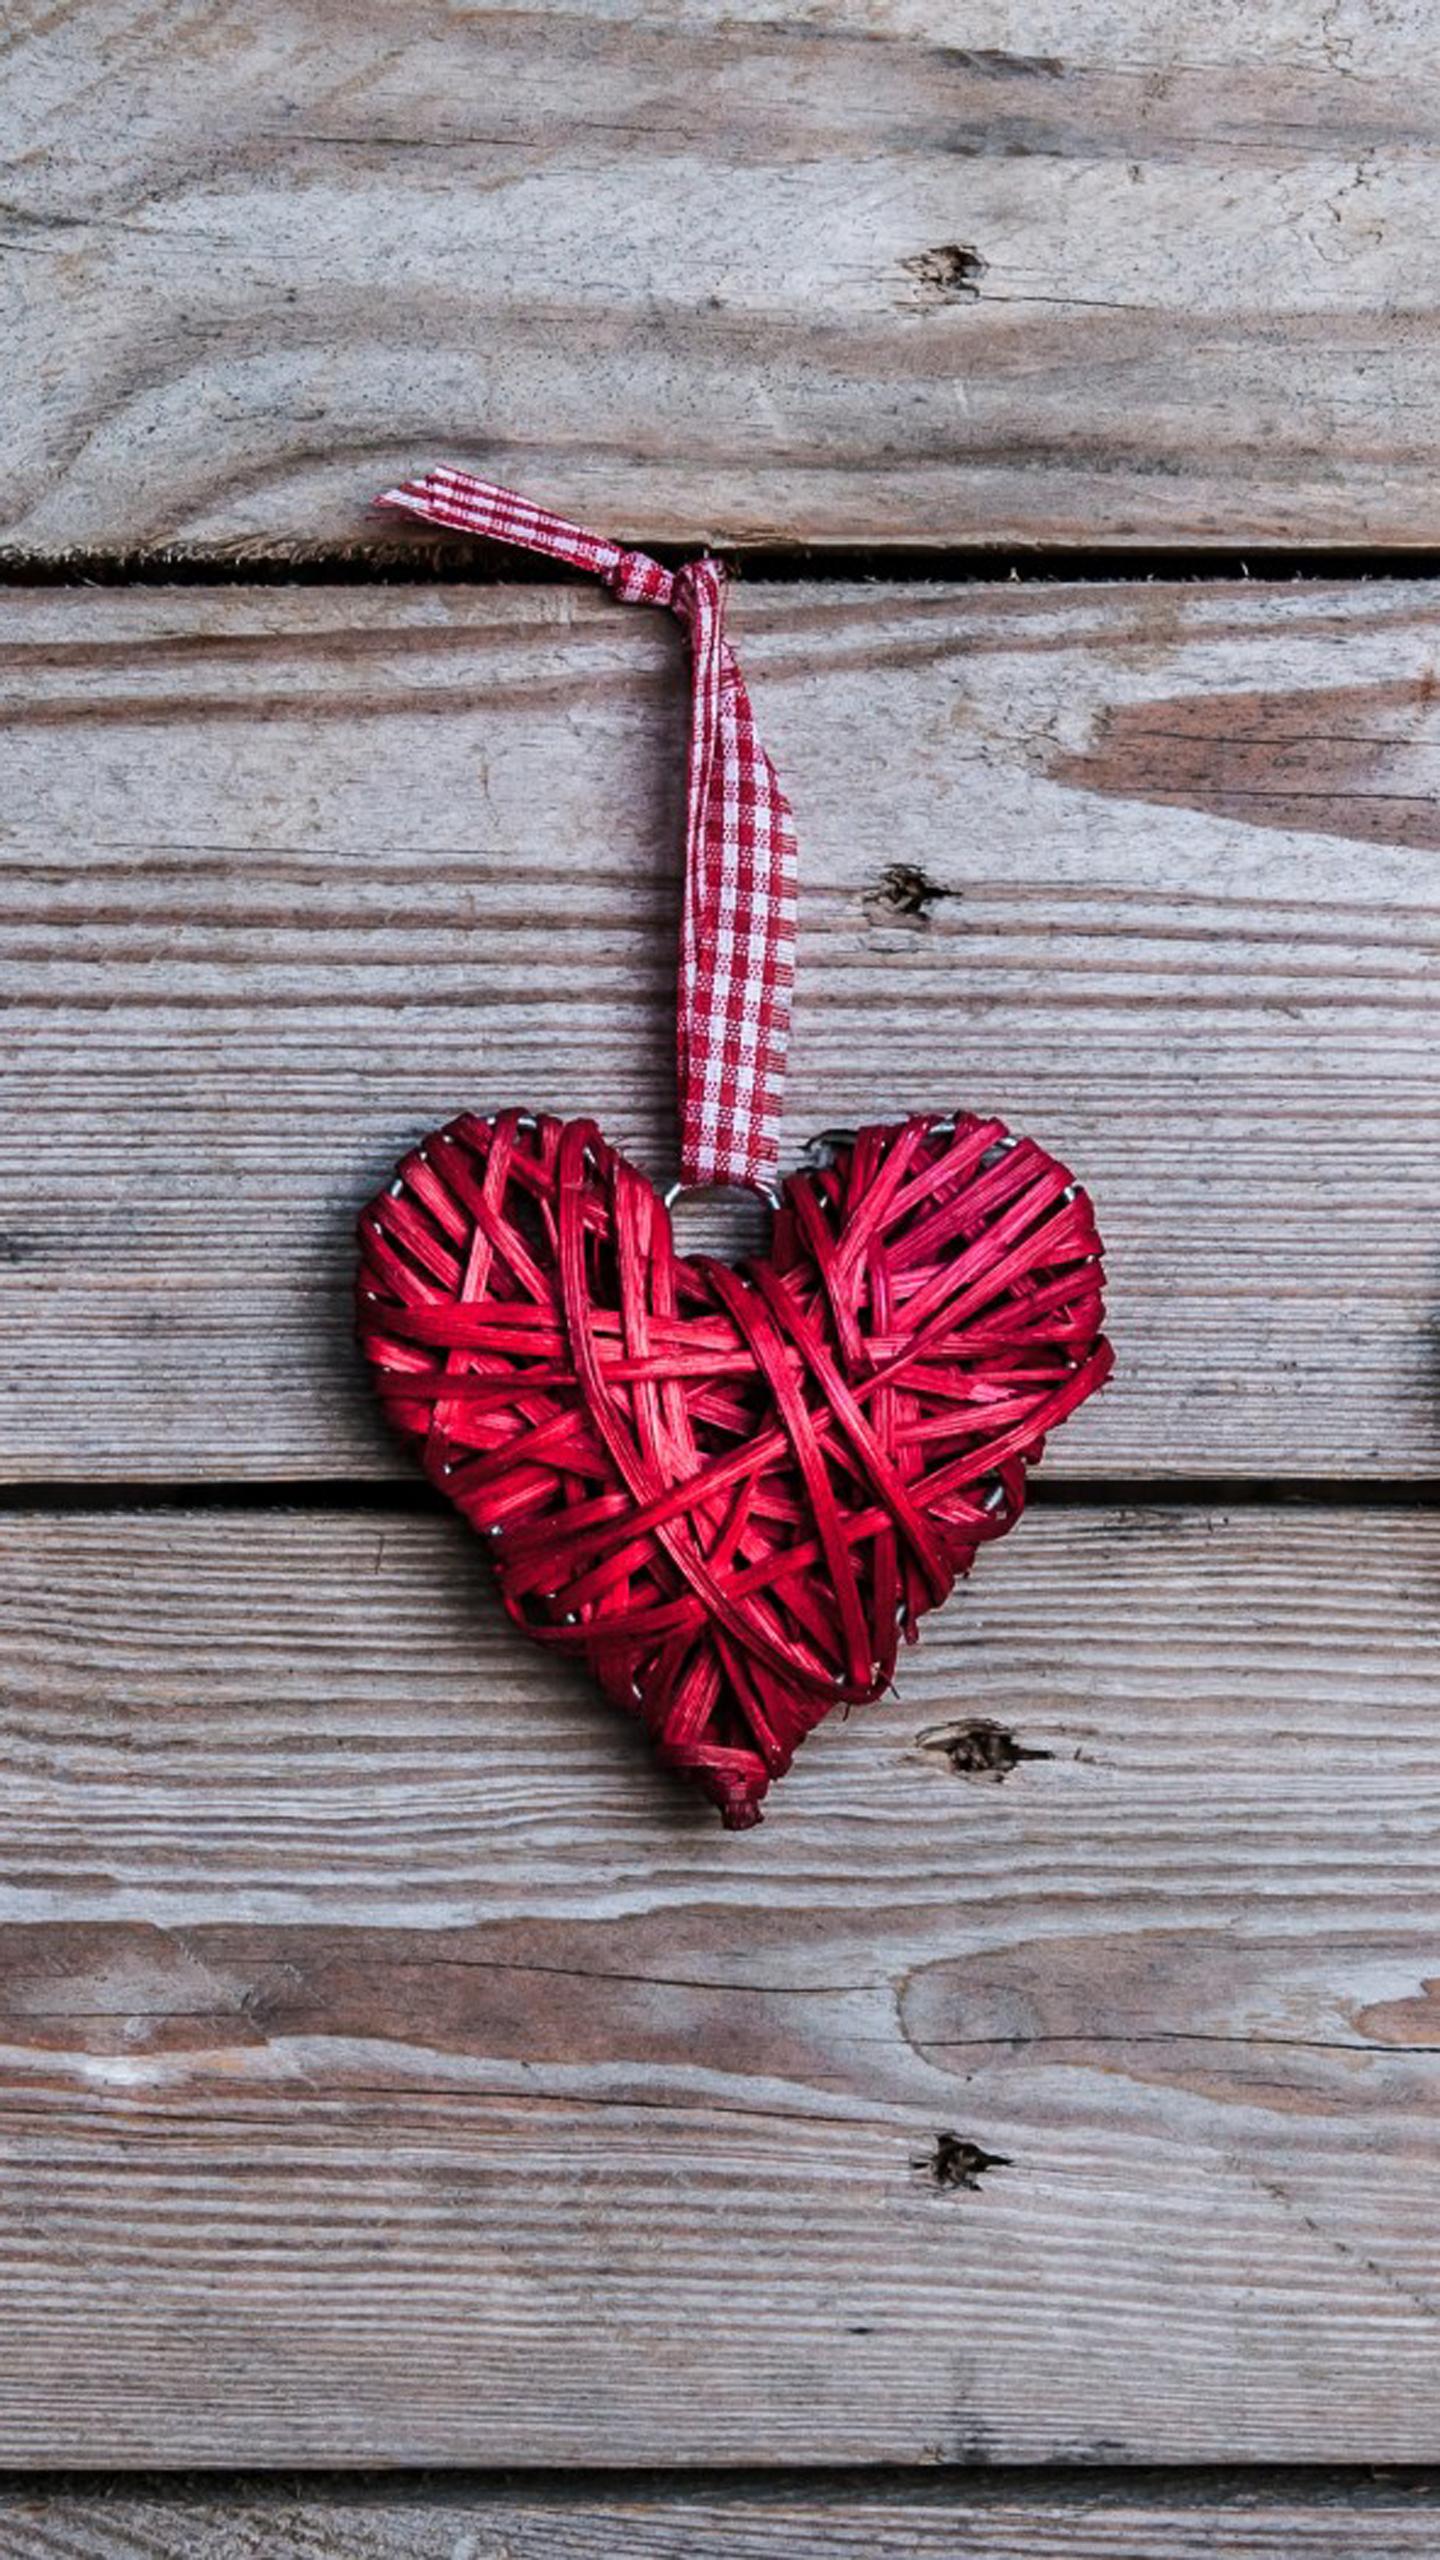 Handmade Romantic Valentine Heart خلفيات موبايل شاومي نوت 7 1440x2560 Download Hd Wallpaper Wallpapertip